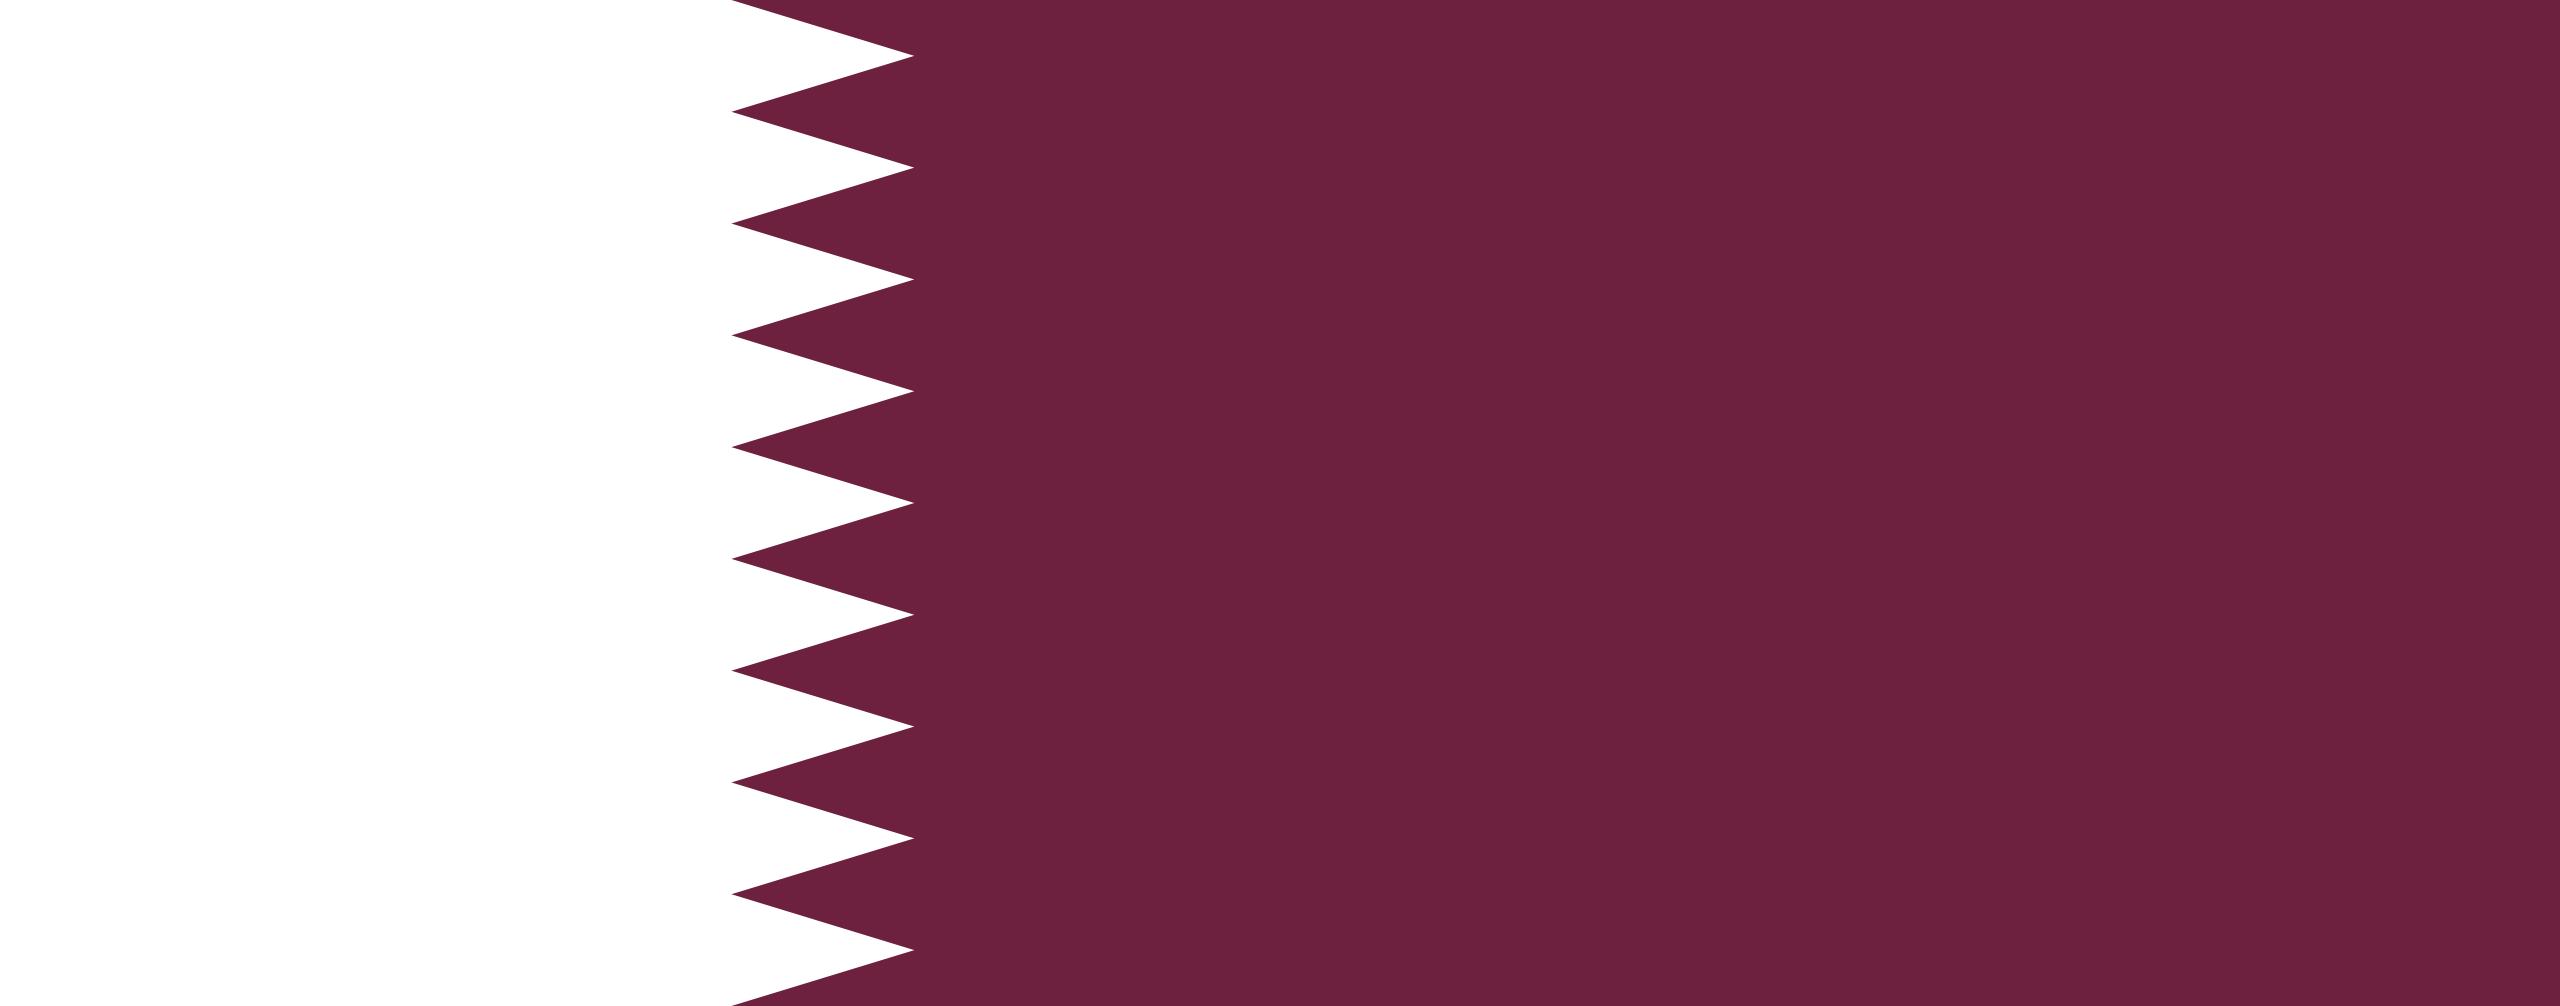 qatar, paese, emblema, logo, simbolo - Sfondi HD - Professor-falken.com